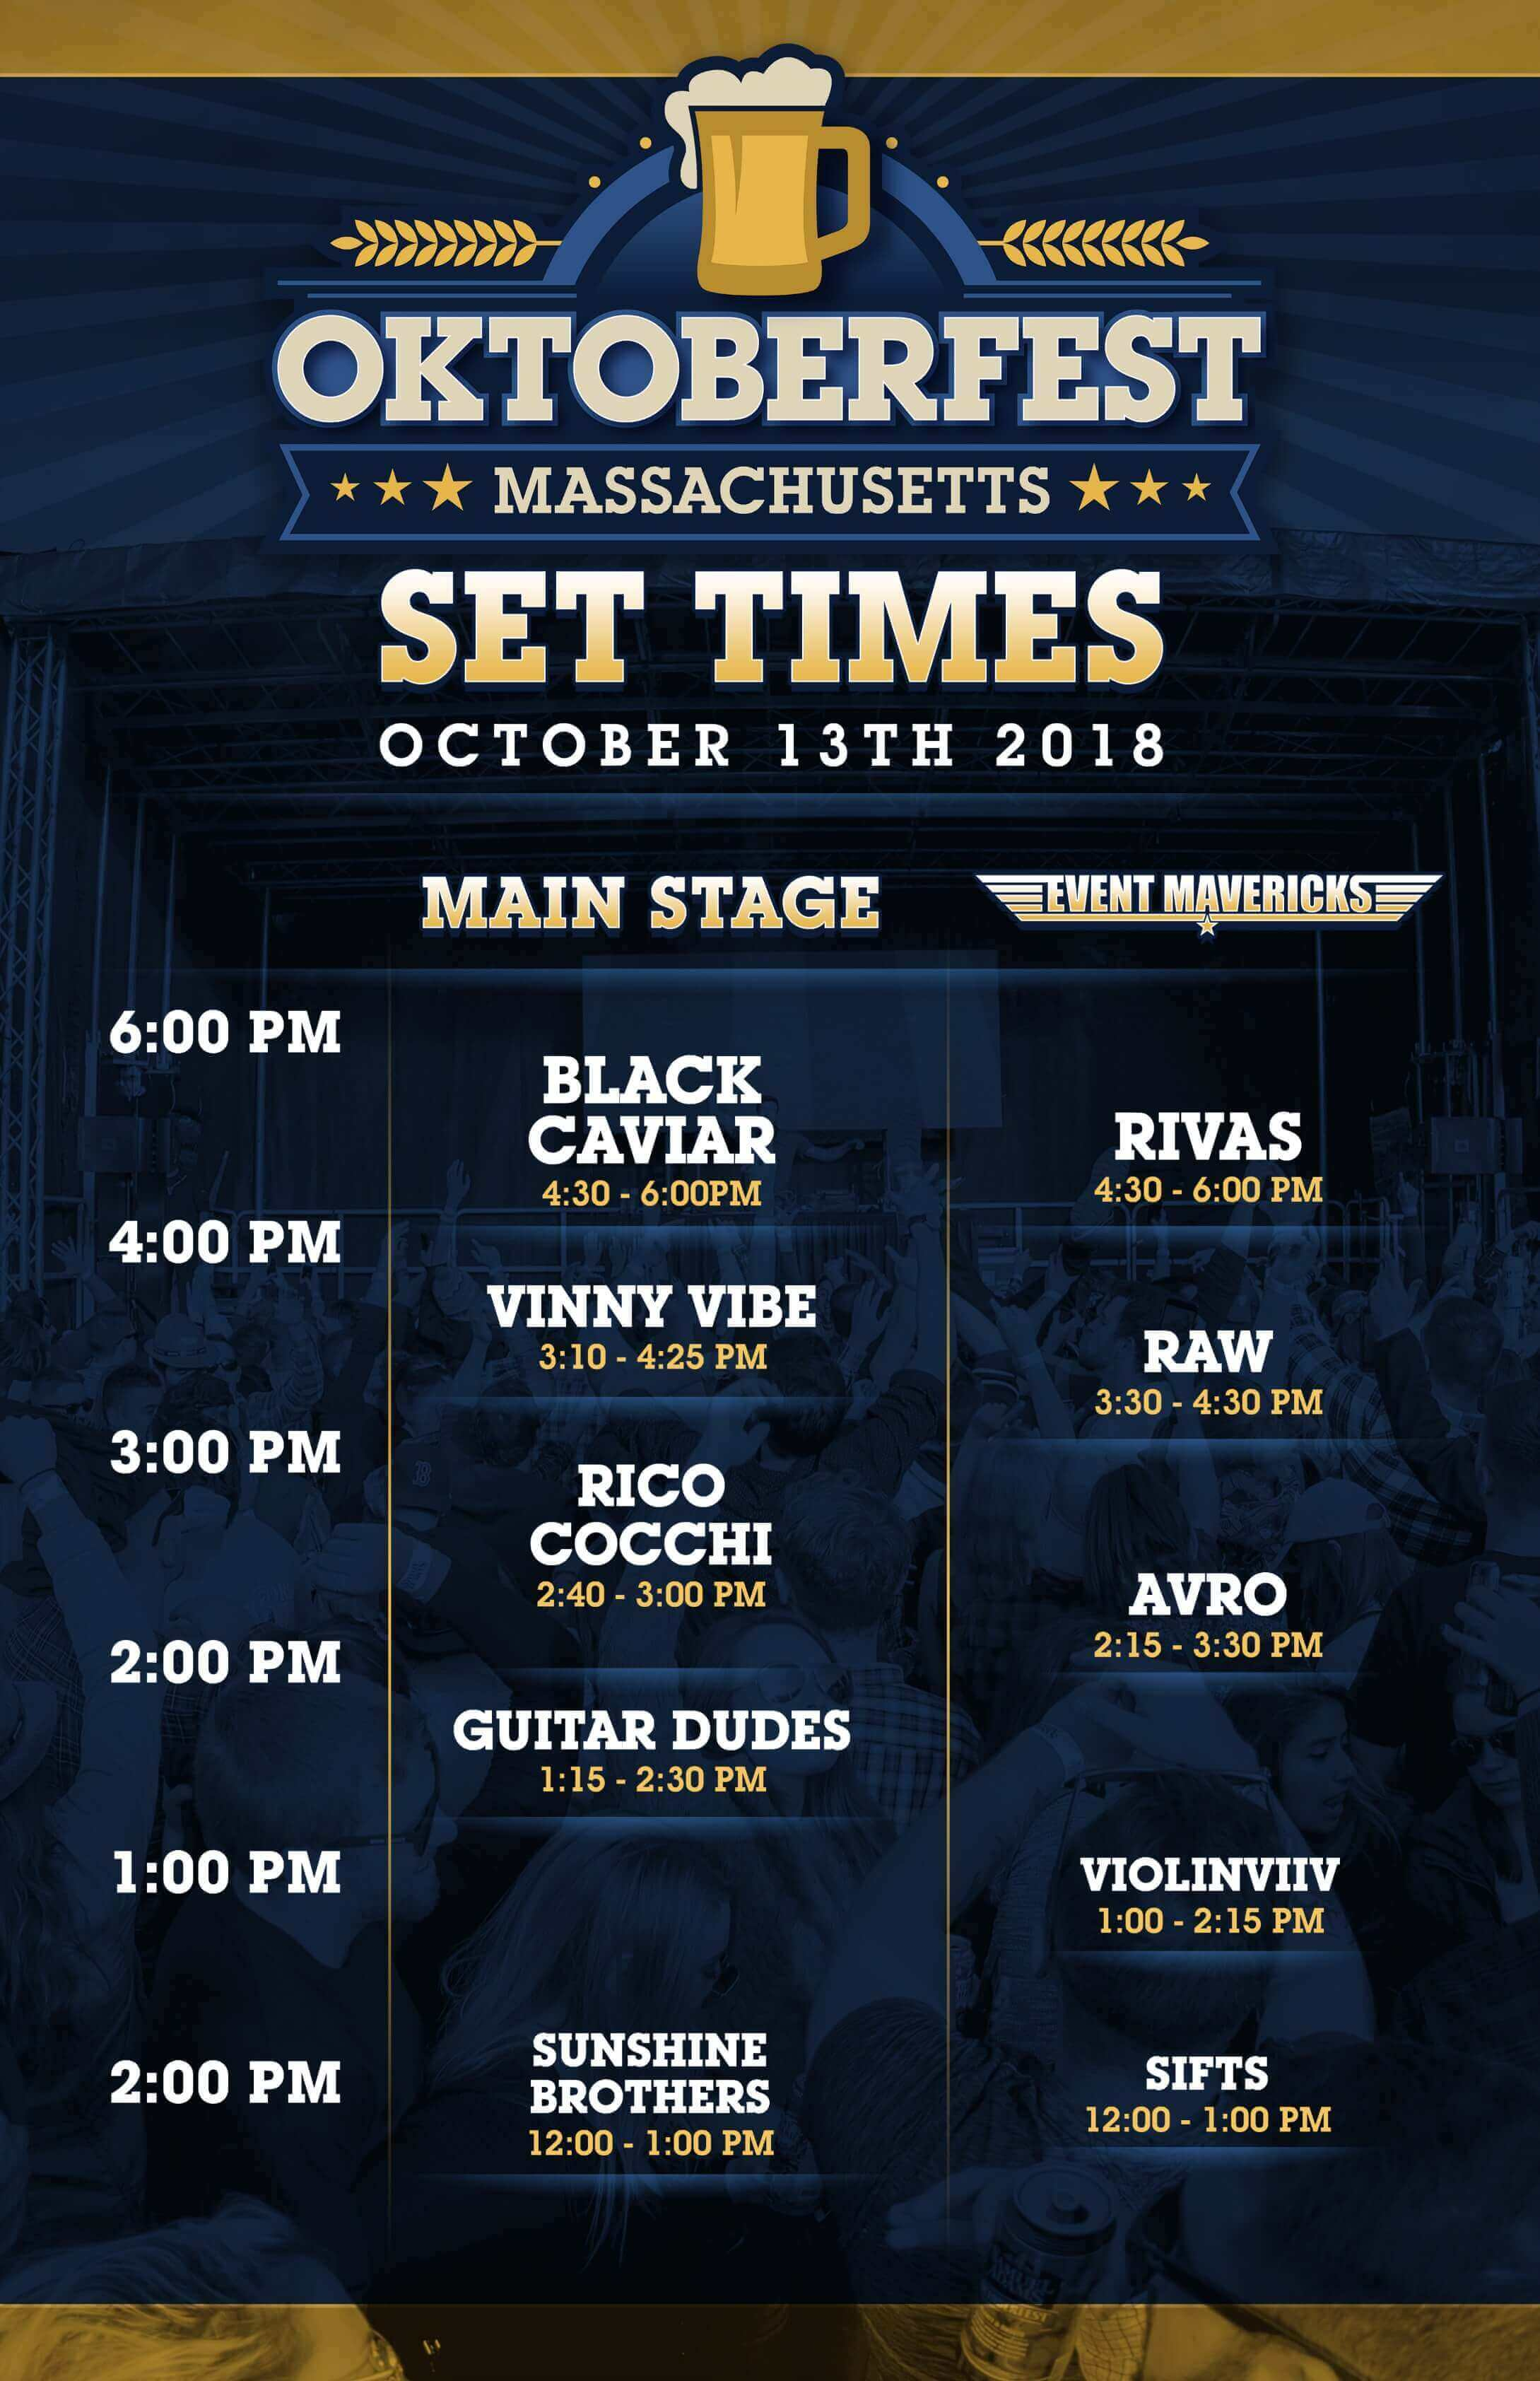 2018_Oktoberfest_Poster_11x17_Set_Times